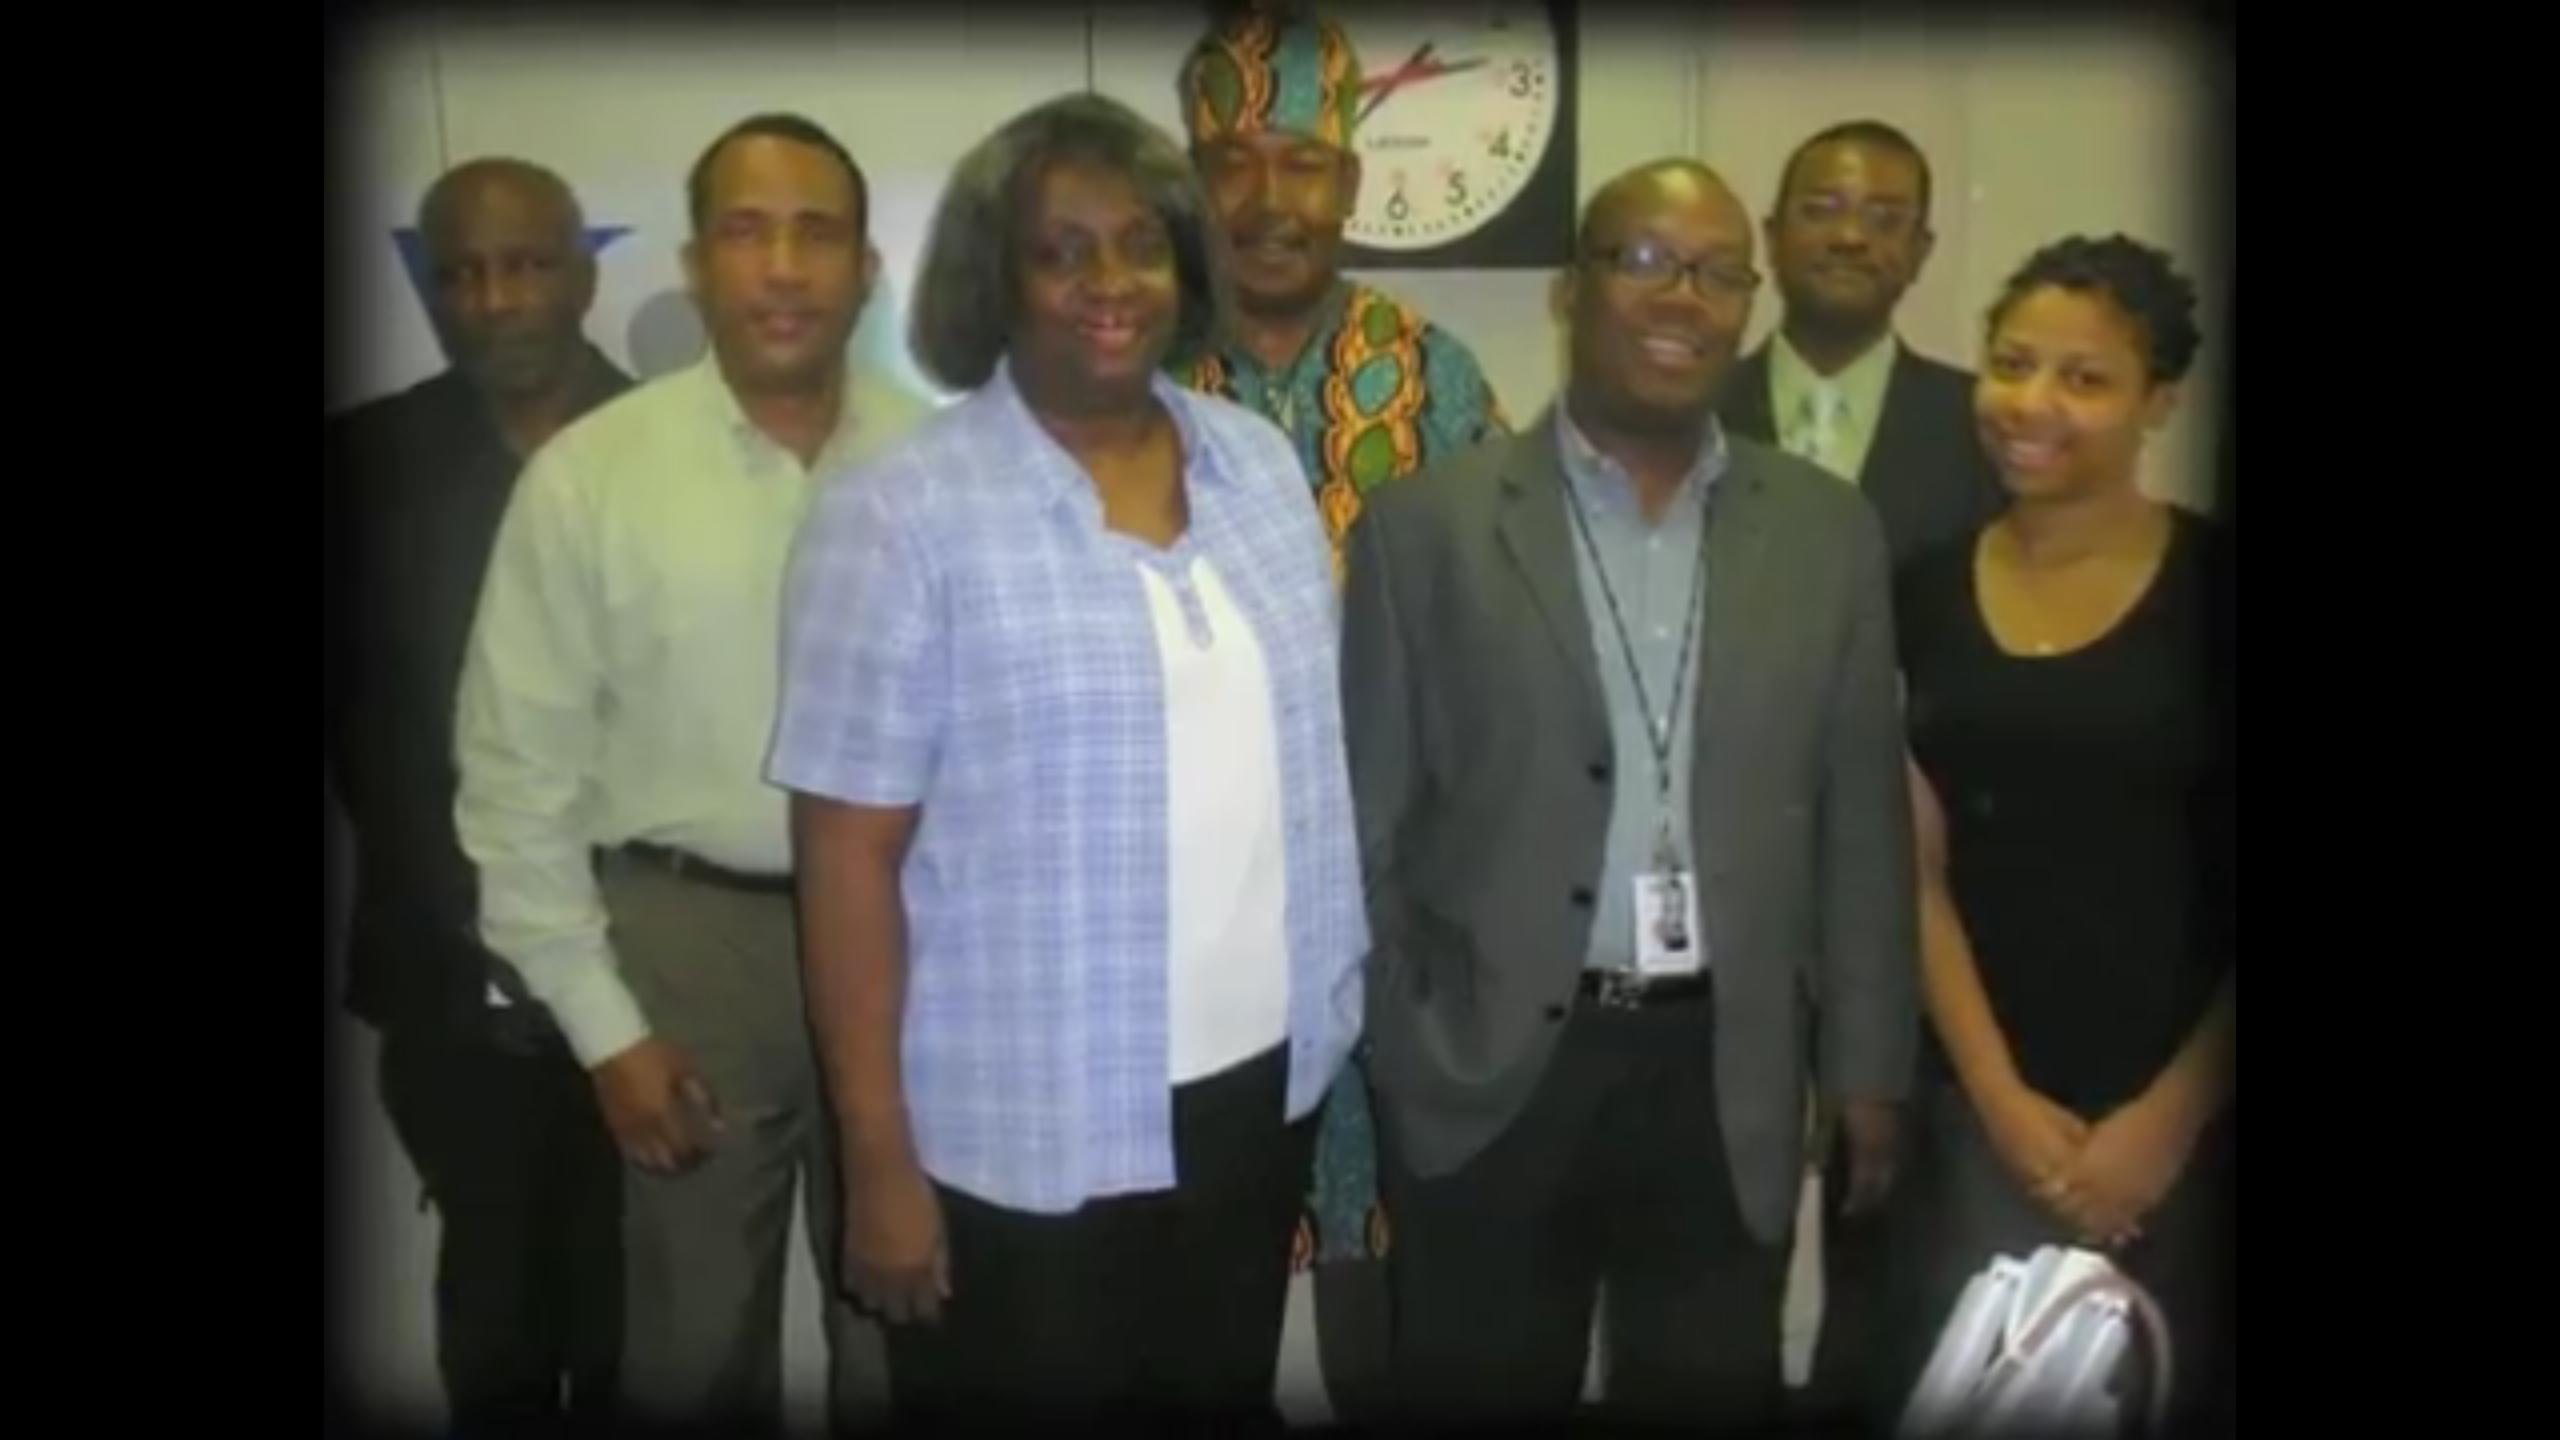 VOA's Creole Service